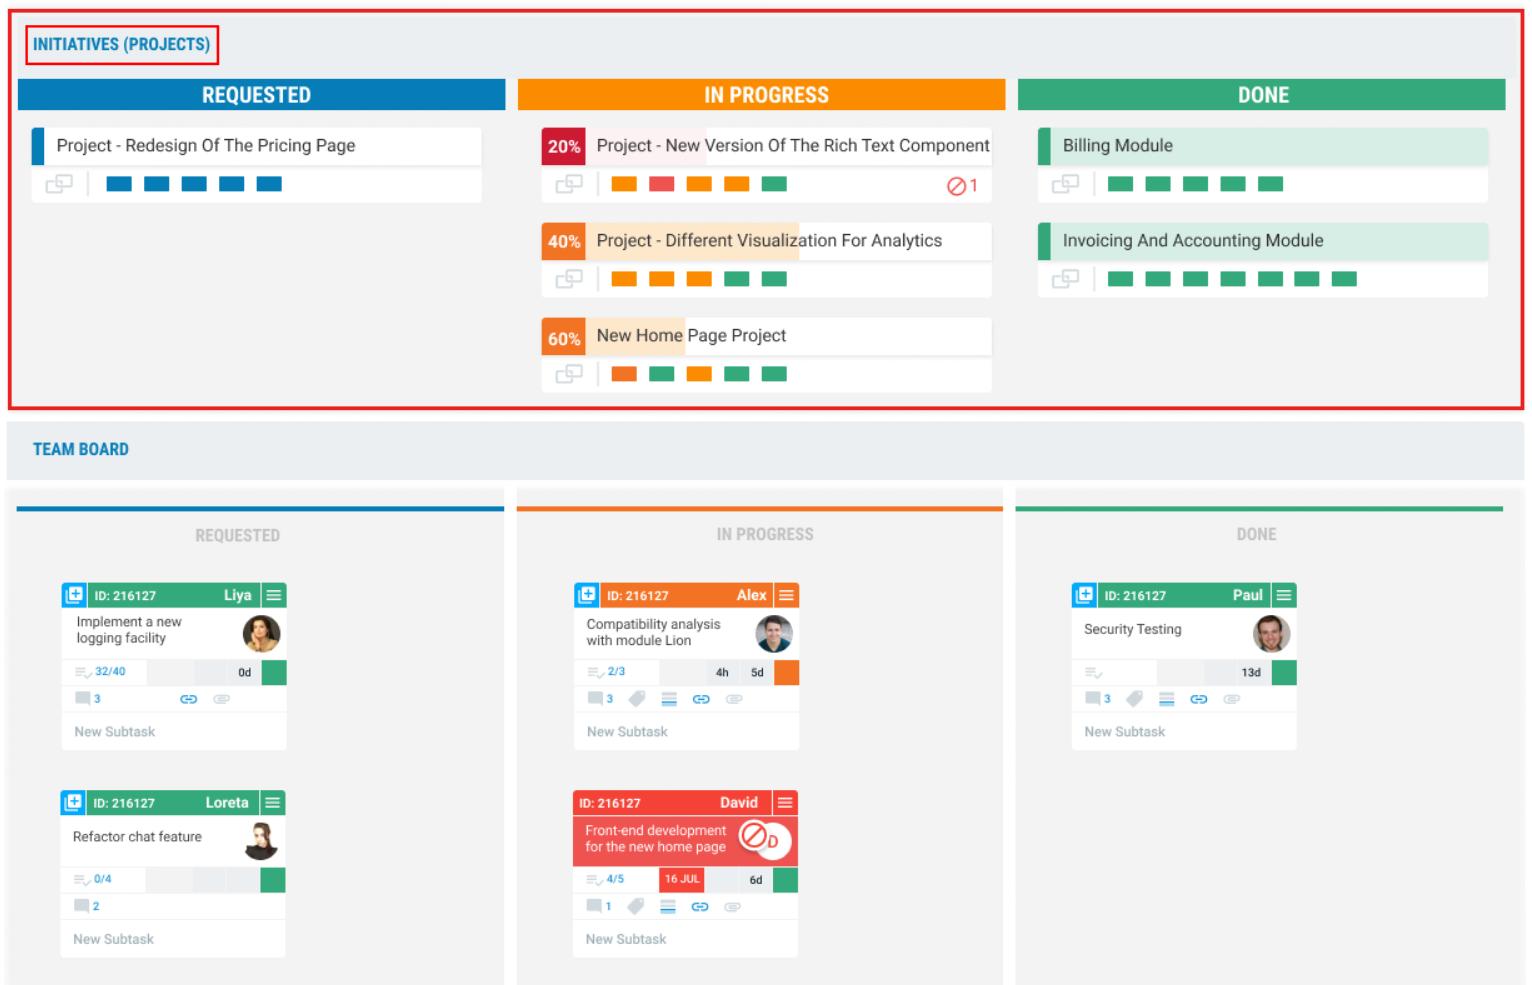 Kanban project management - initiatives flow